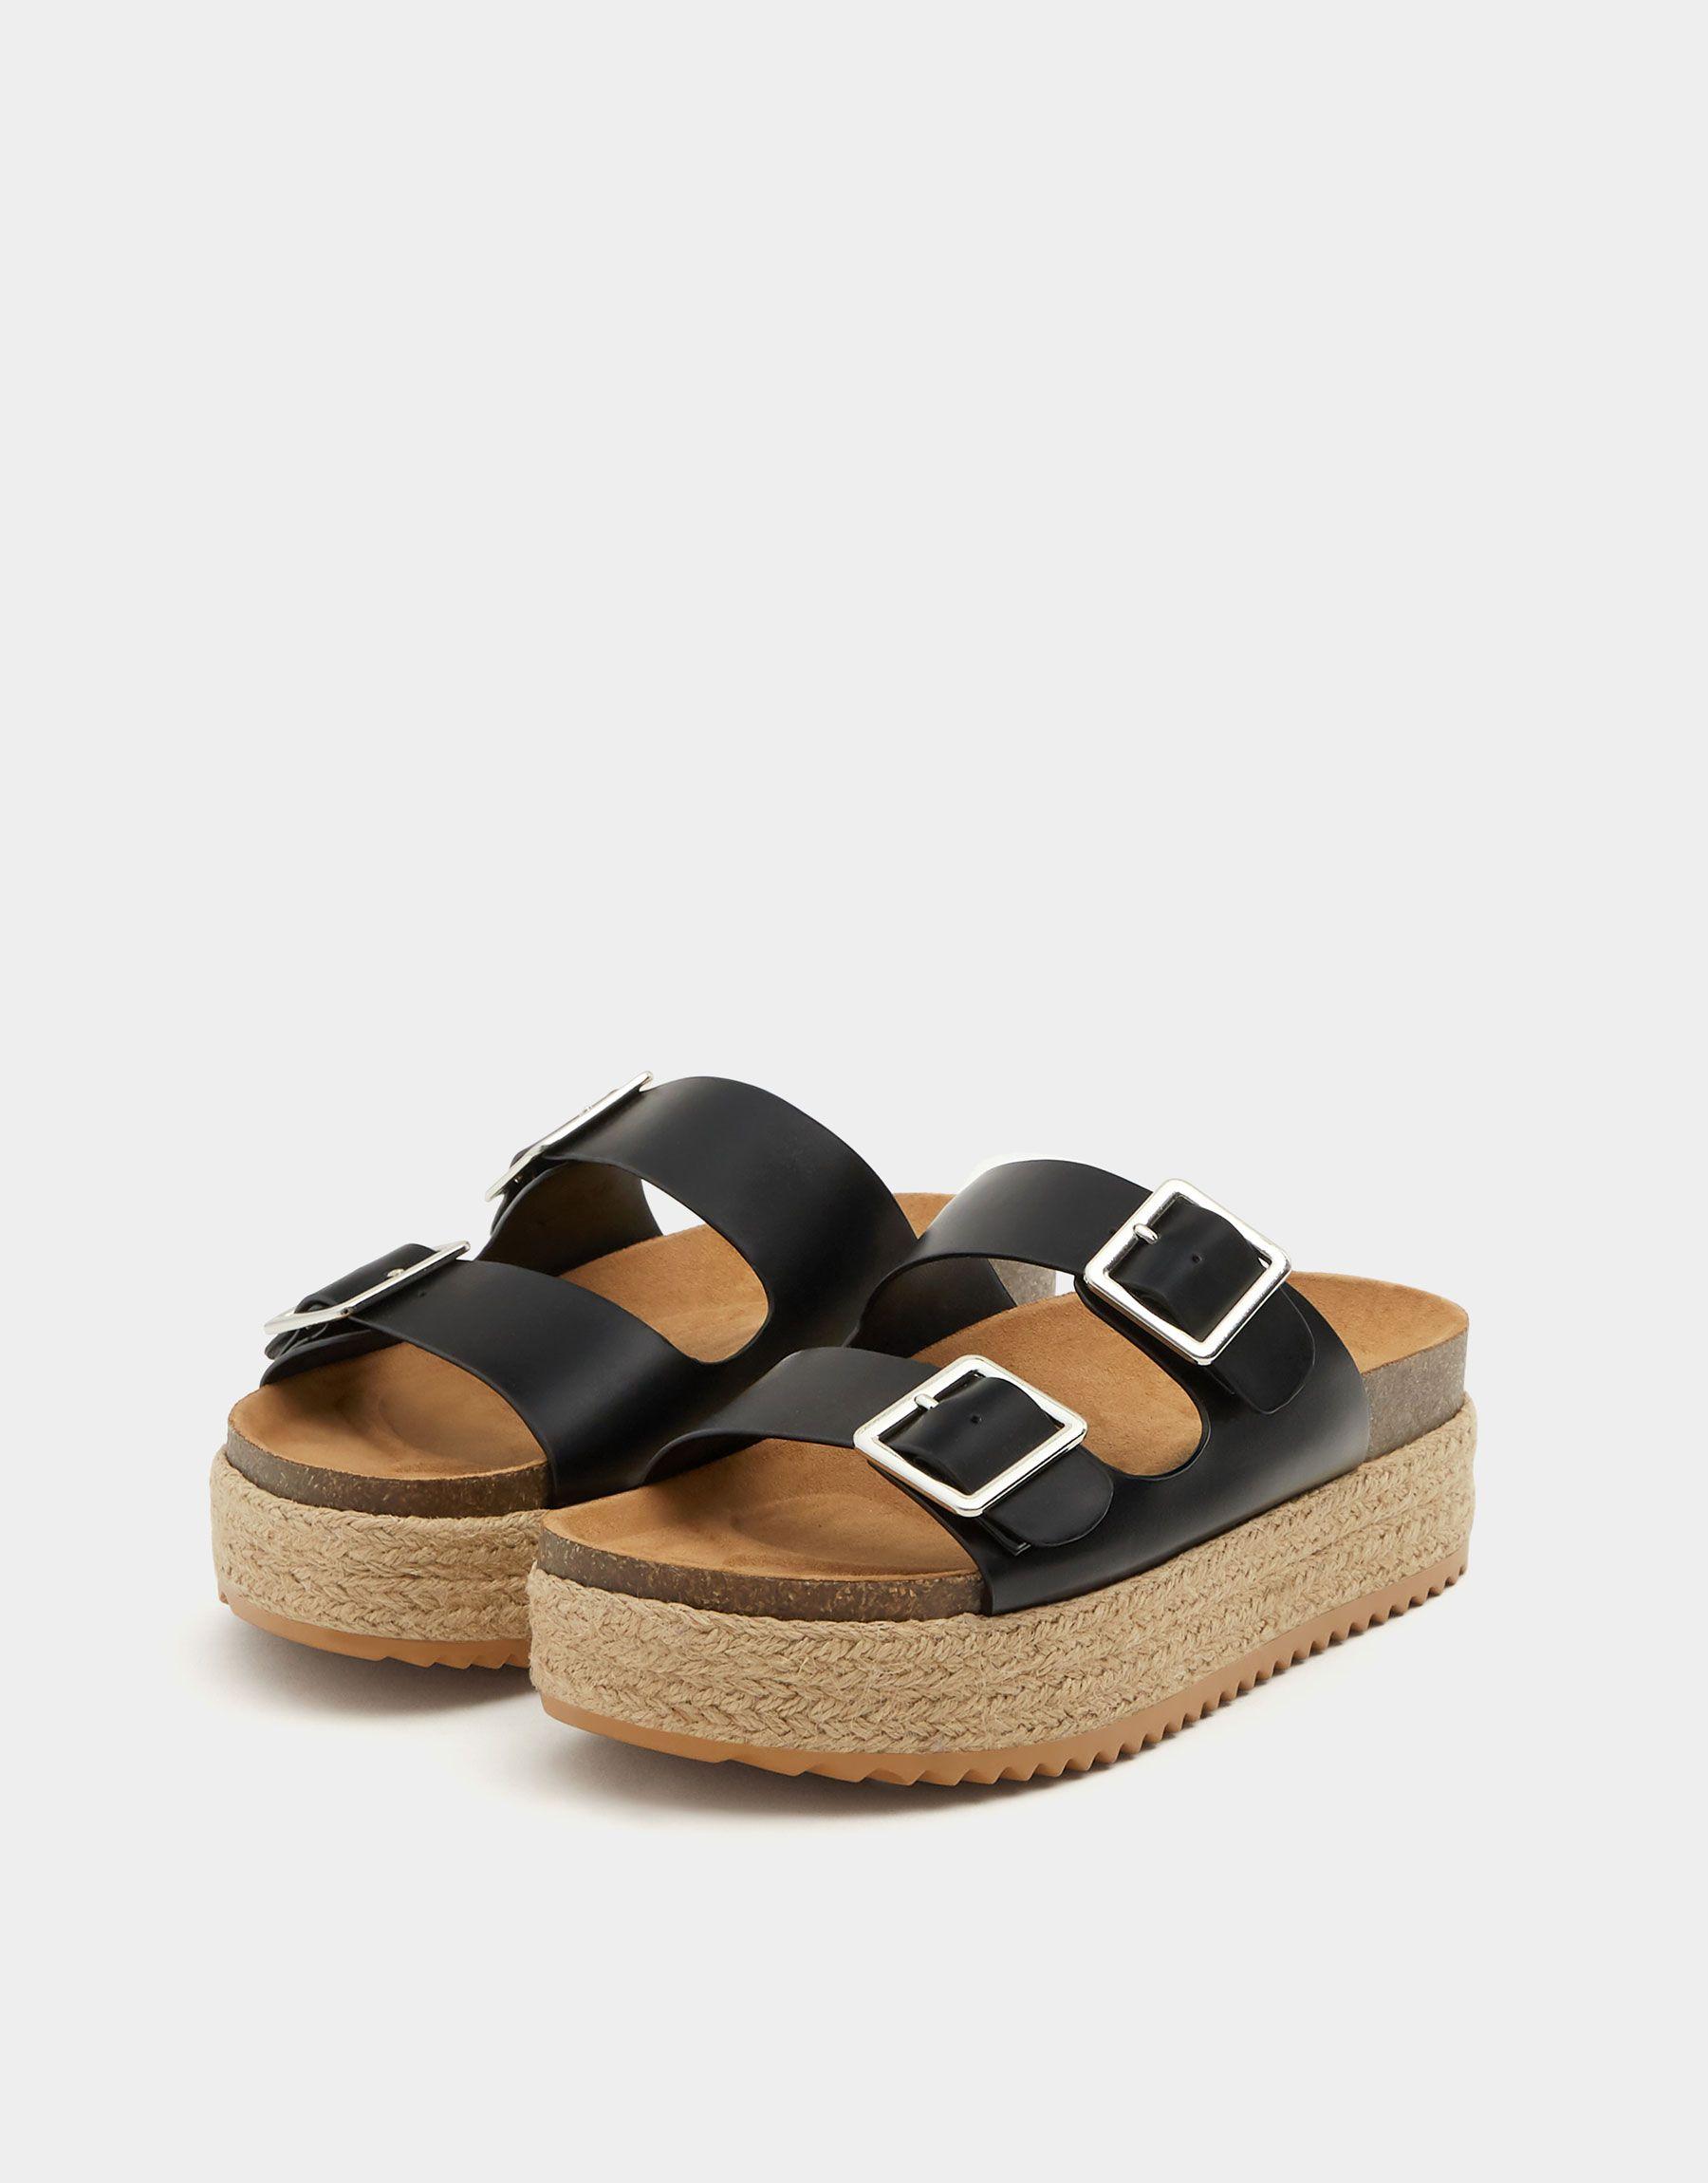 f1fb69bb Sandalia negra yute hebillas - Ver todo - Zapatos - Mujer - PULL&BEAR España